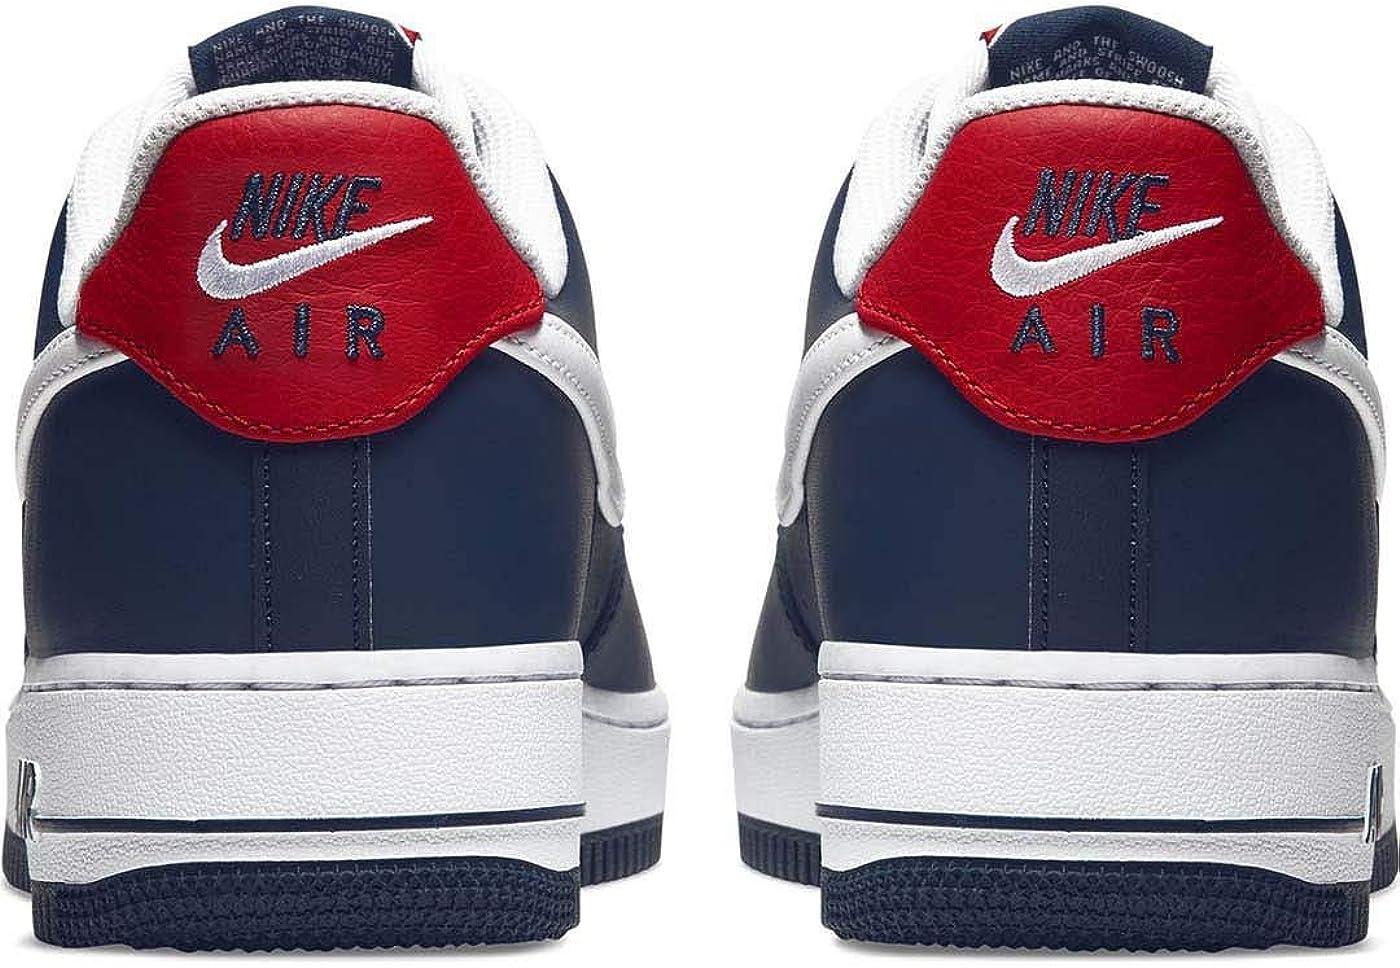 Nike AIR Force 1 '07 LV8 4 Bleu Marine: